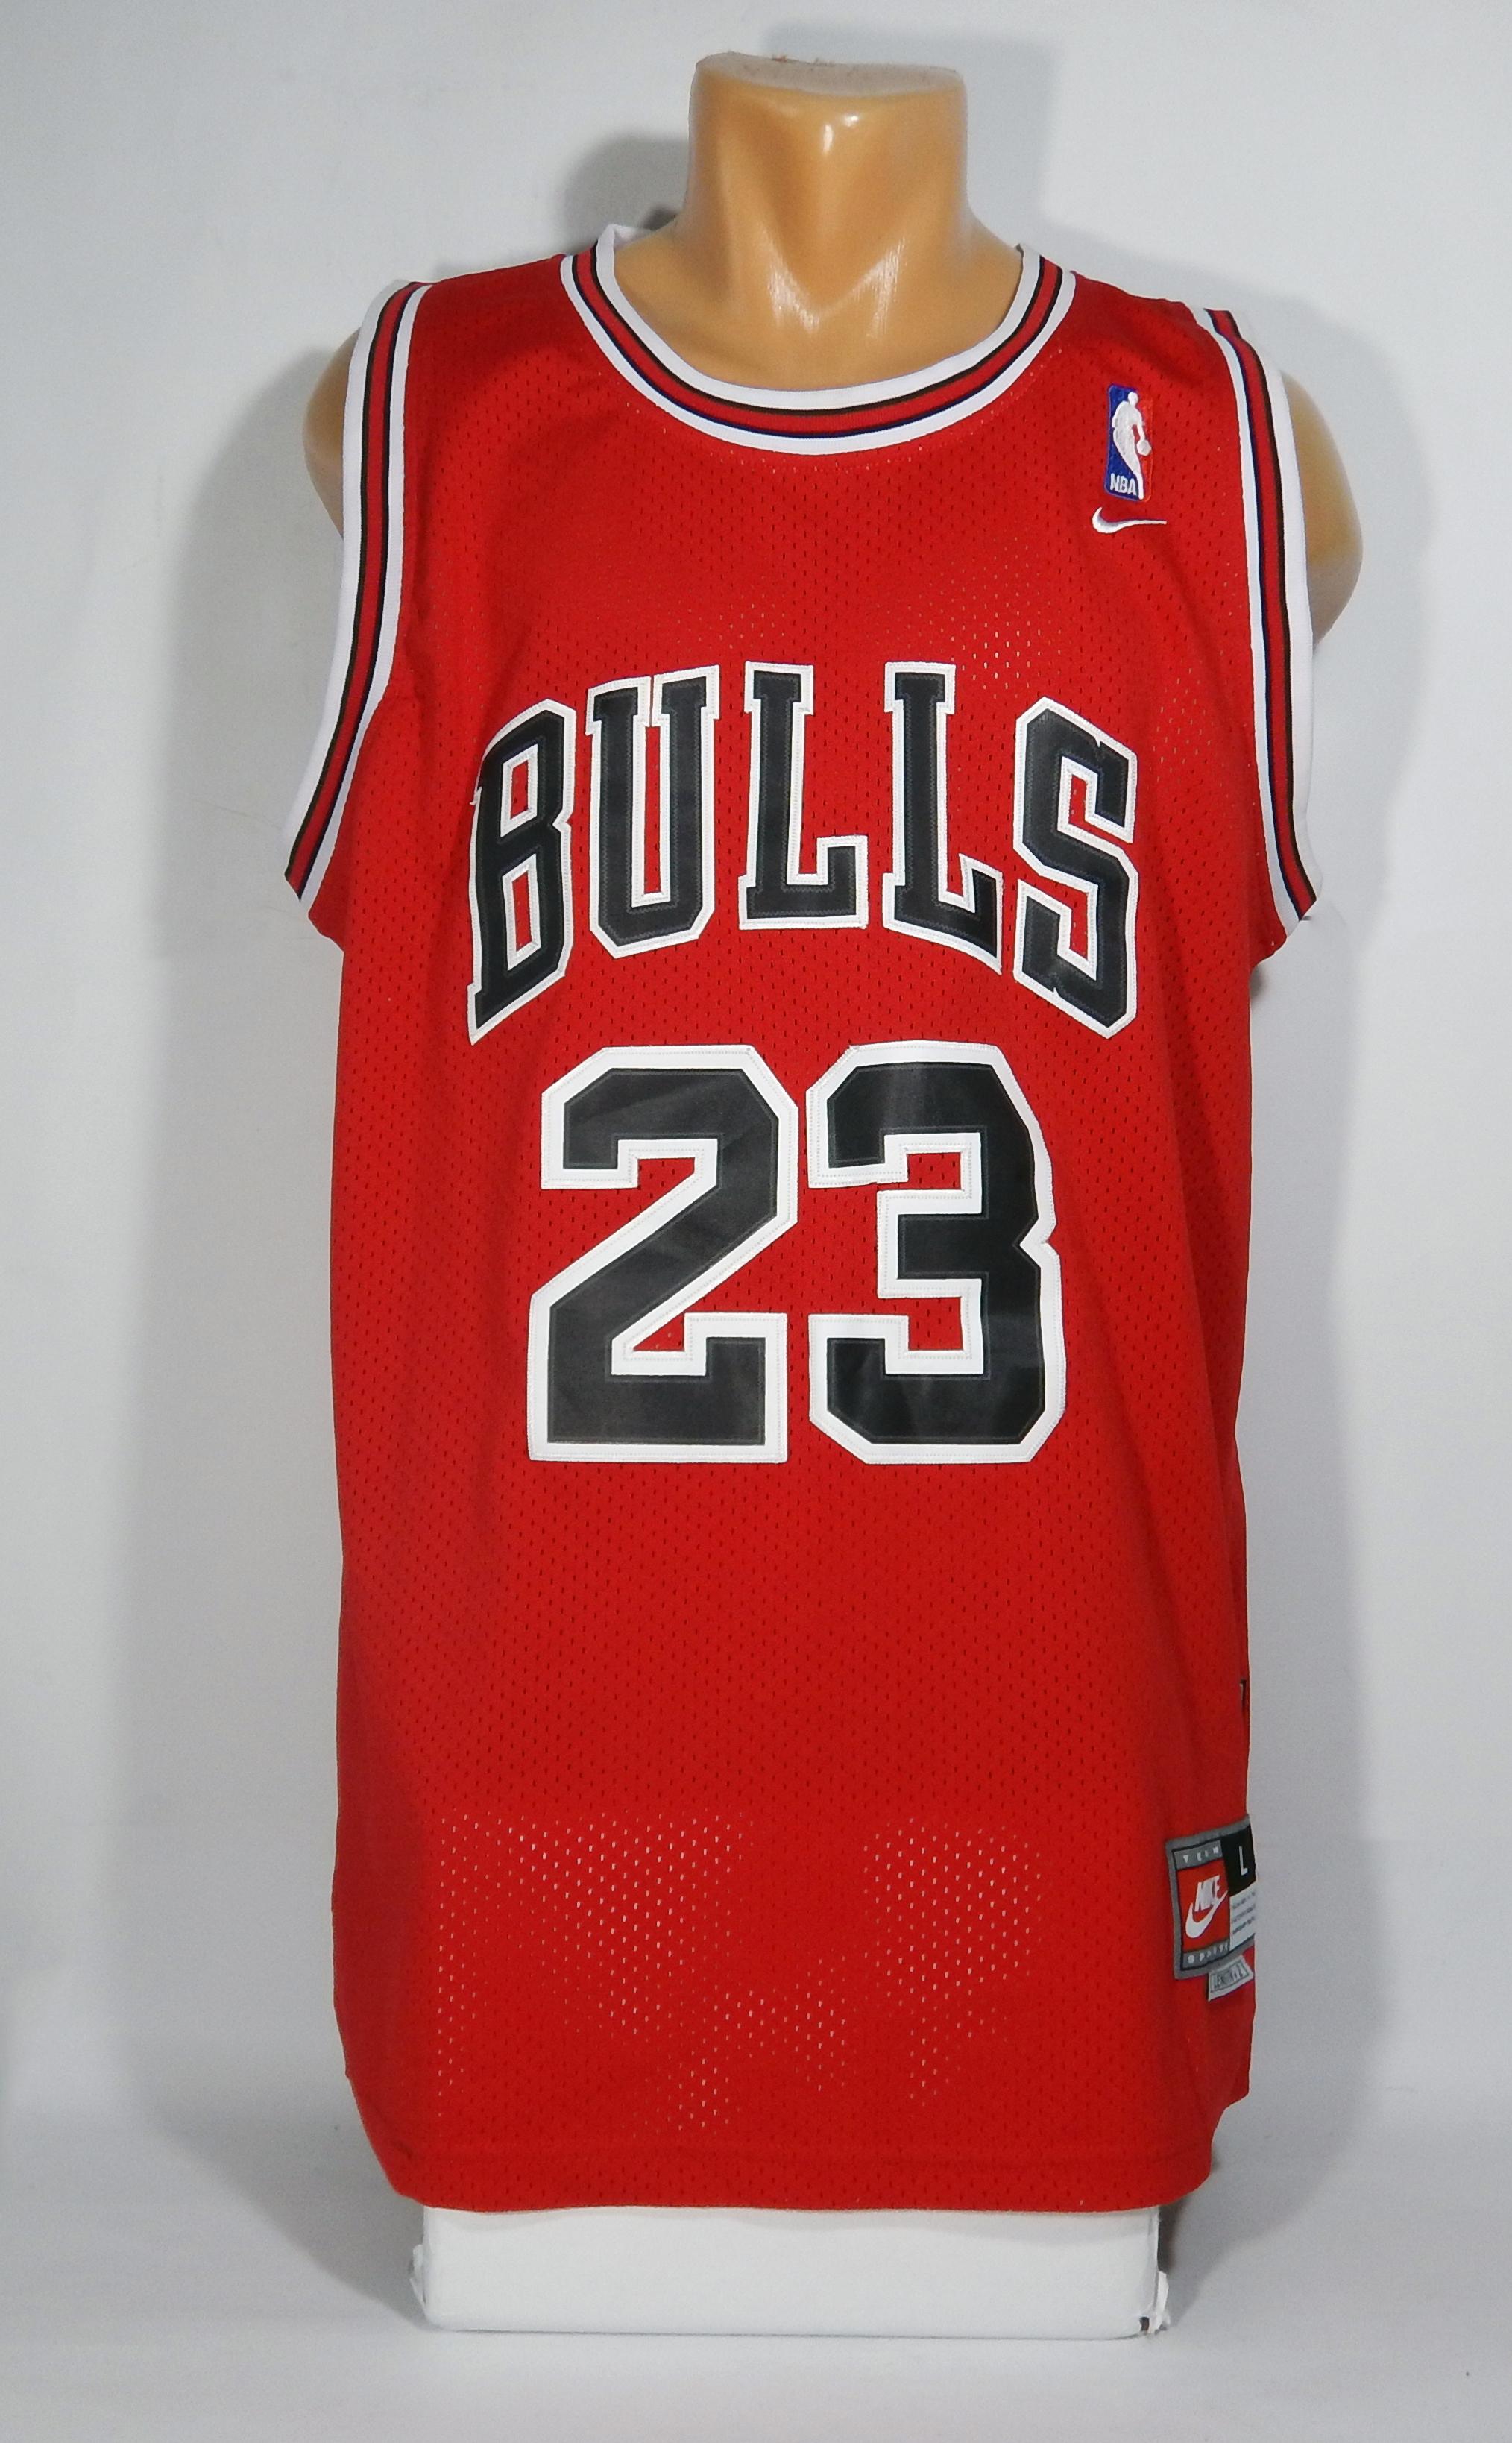 33c299255b1 Nike NBA MICHAEL JORDAN CHICAGO BULLS  23 BASKETBALL JERSEY Size l ...